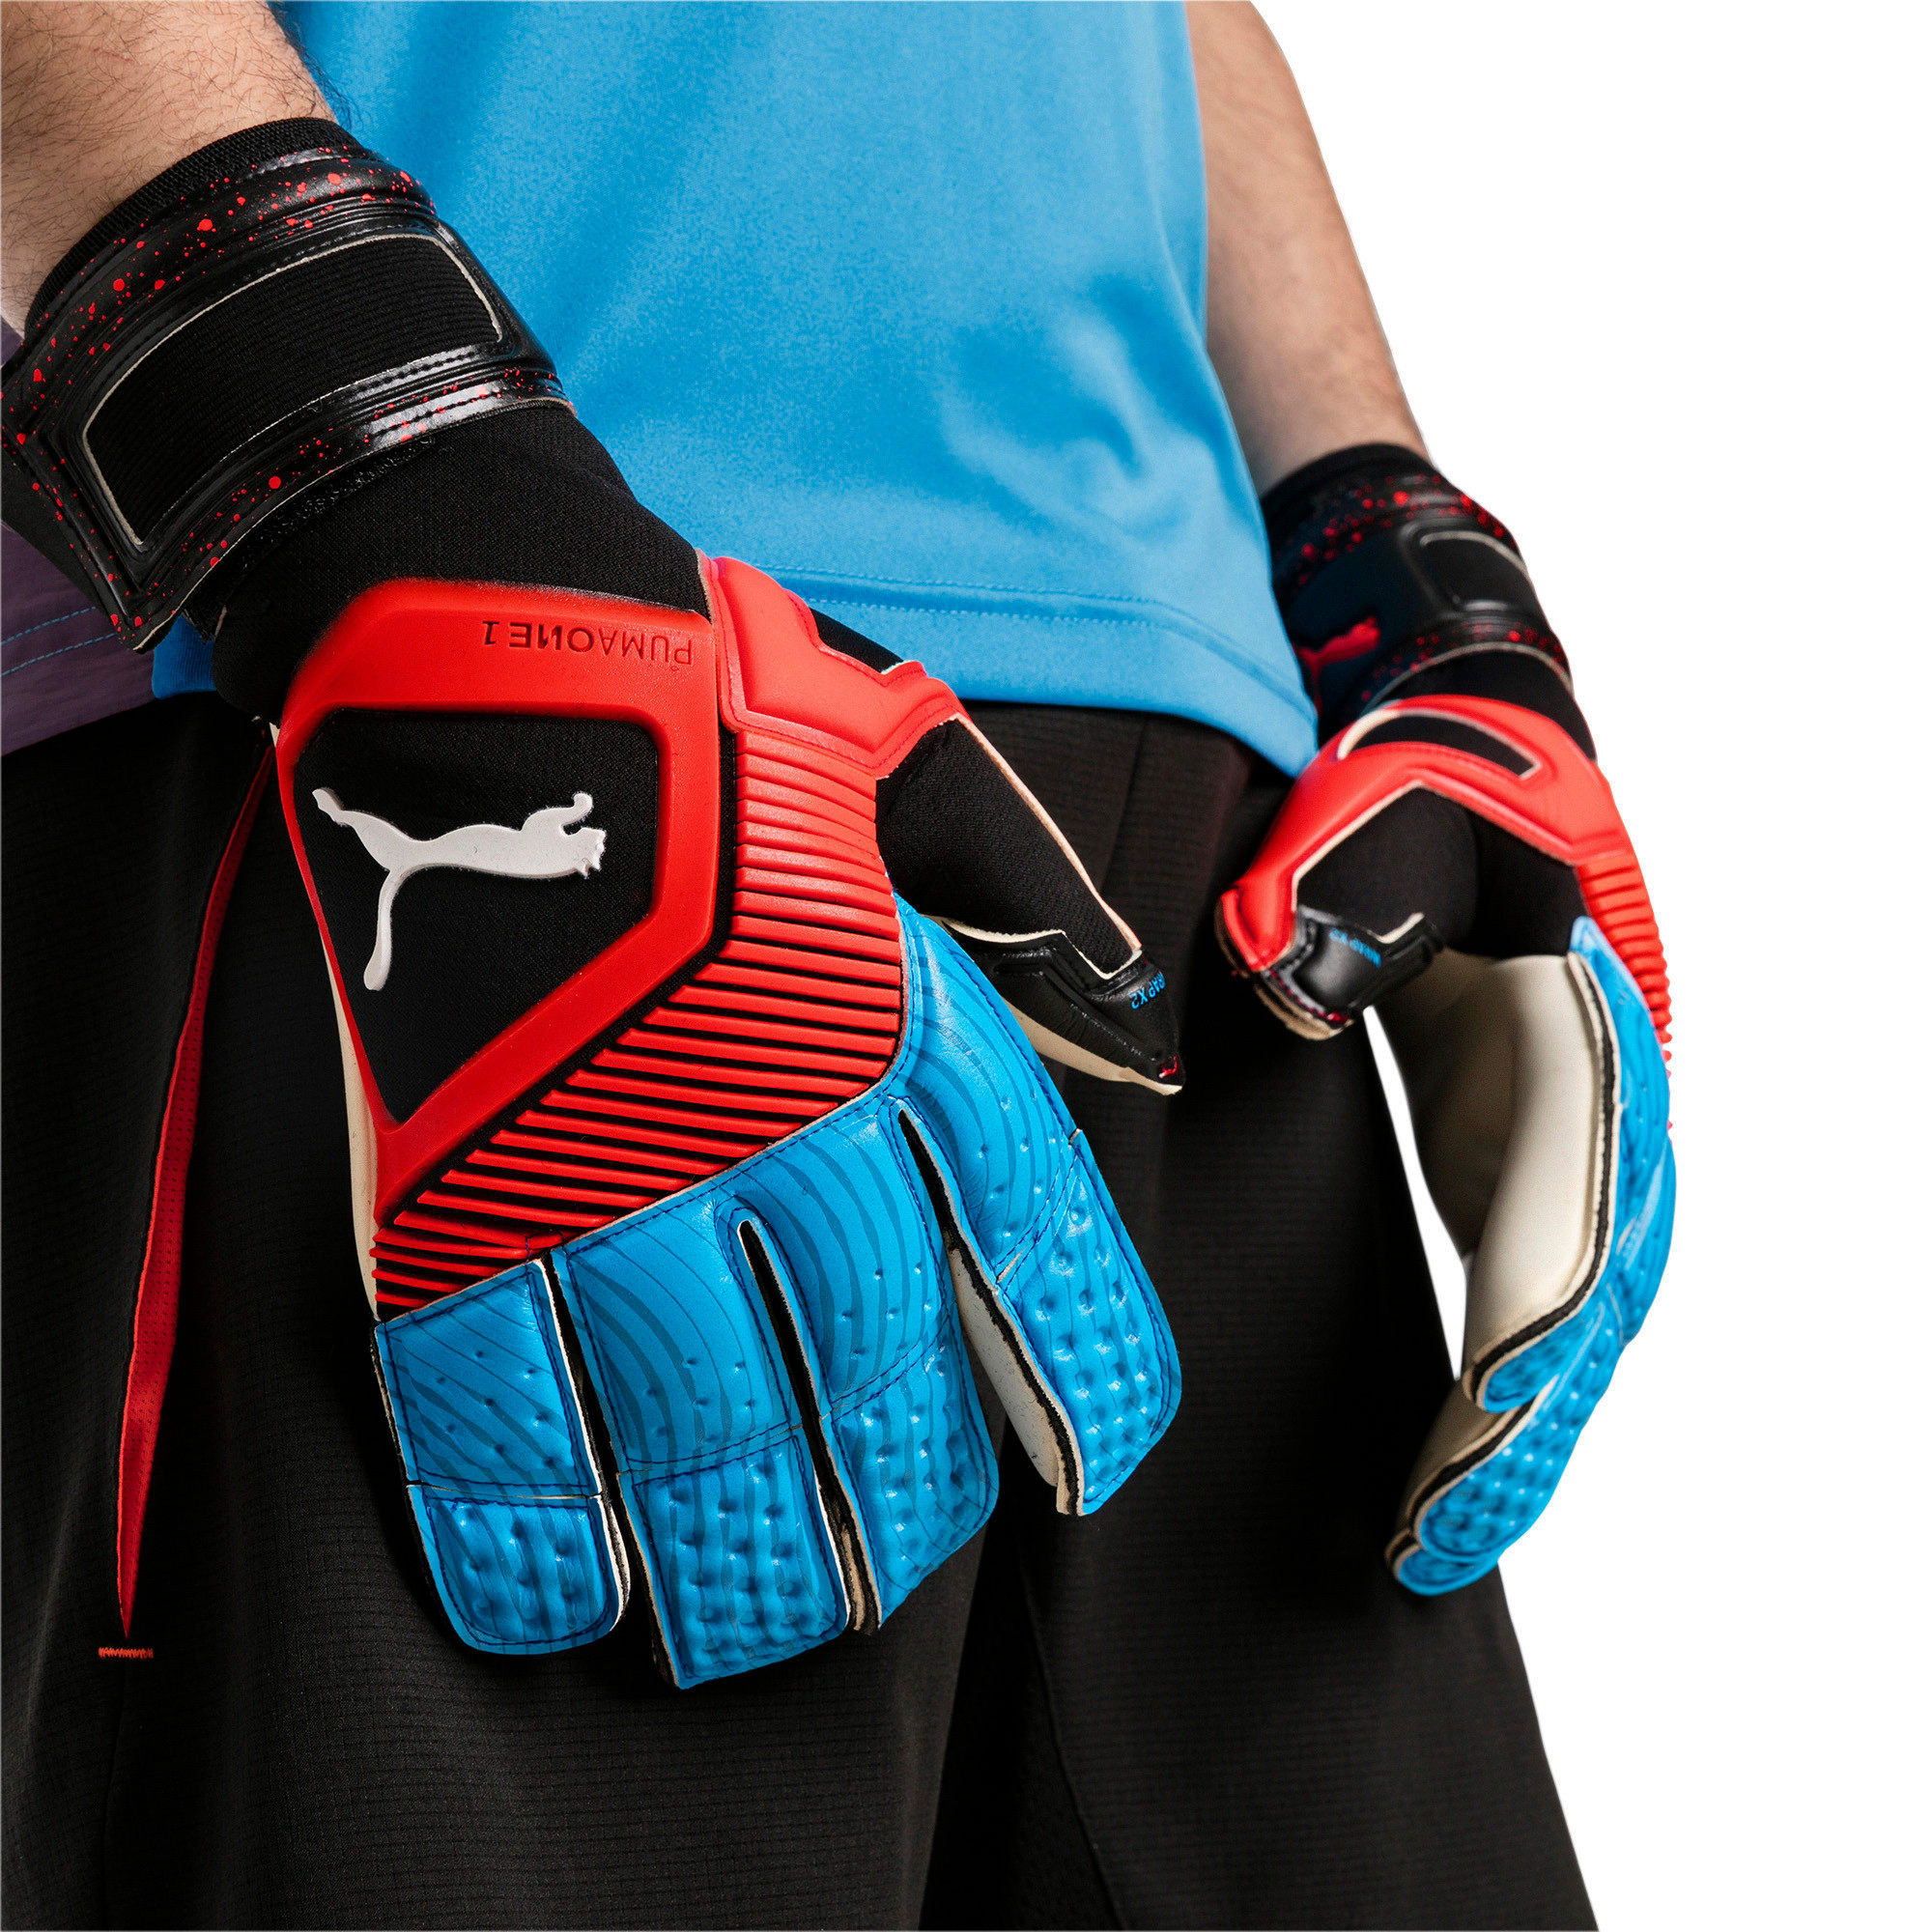 Thumbnail 2 of PUMA ONE Grip 1 Hybrid Pro Goalkeeper Gloves, Black-Bleu Azur-Red Blast, medium